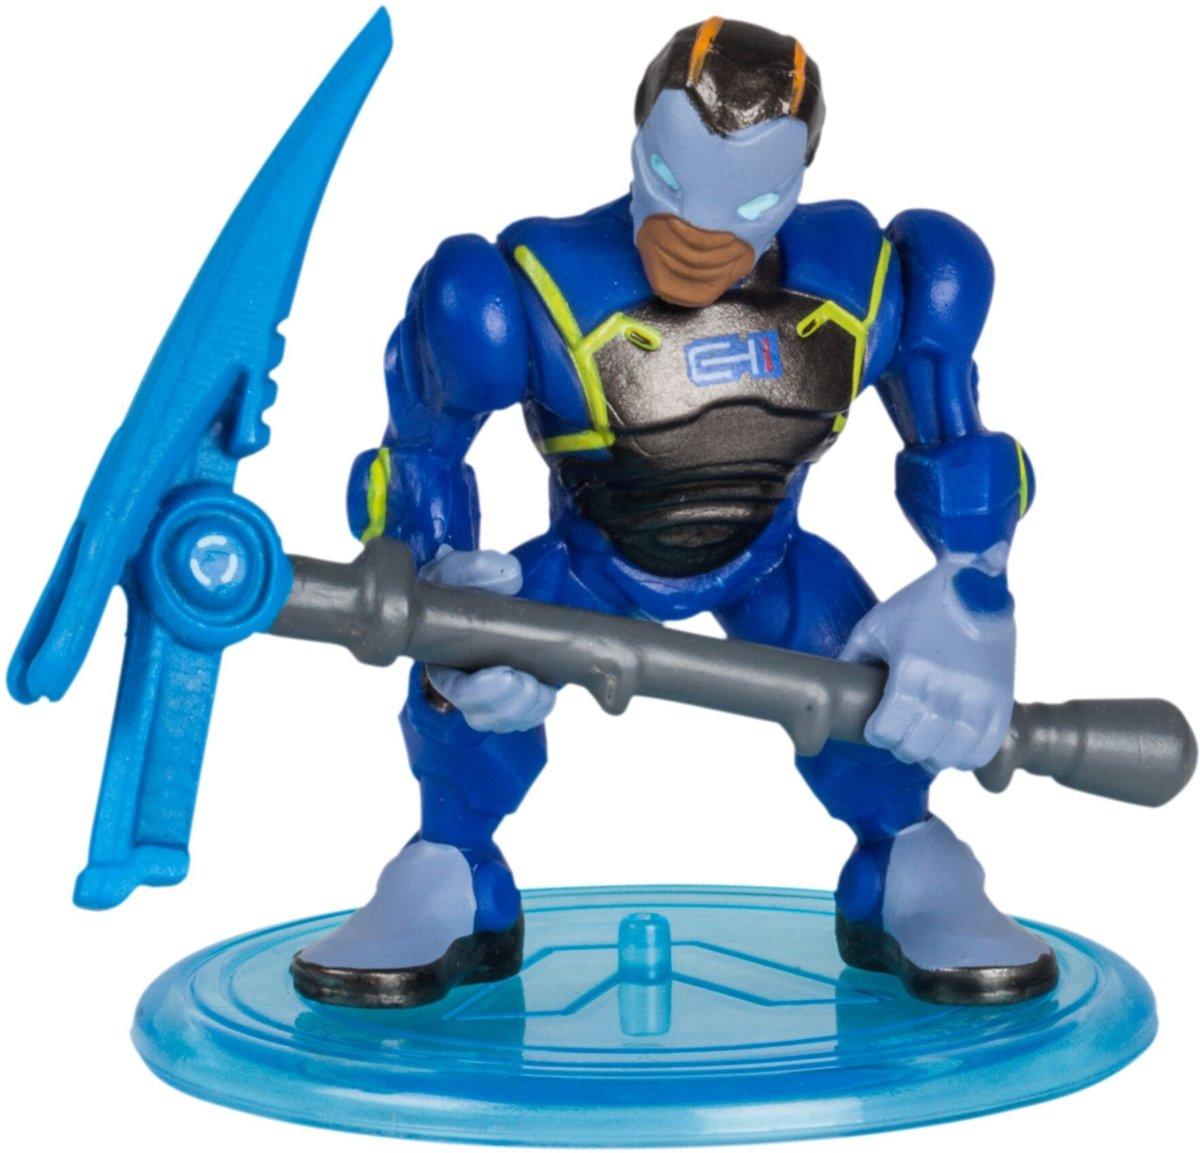 Moose Toys Fortnite Battle Royale Collection - Carbide Blauw